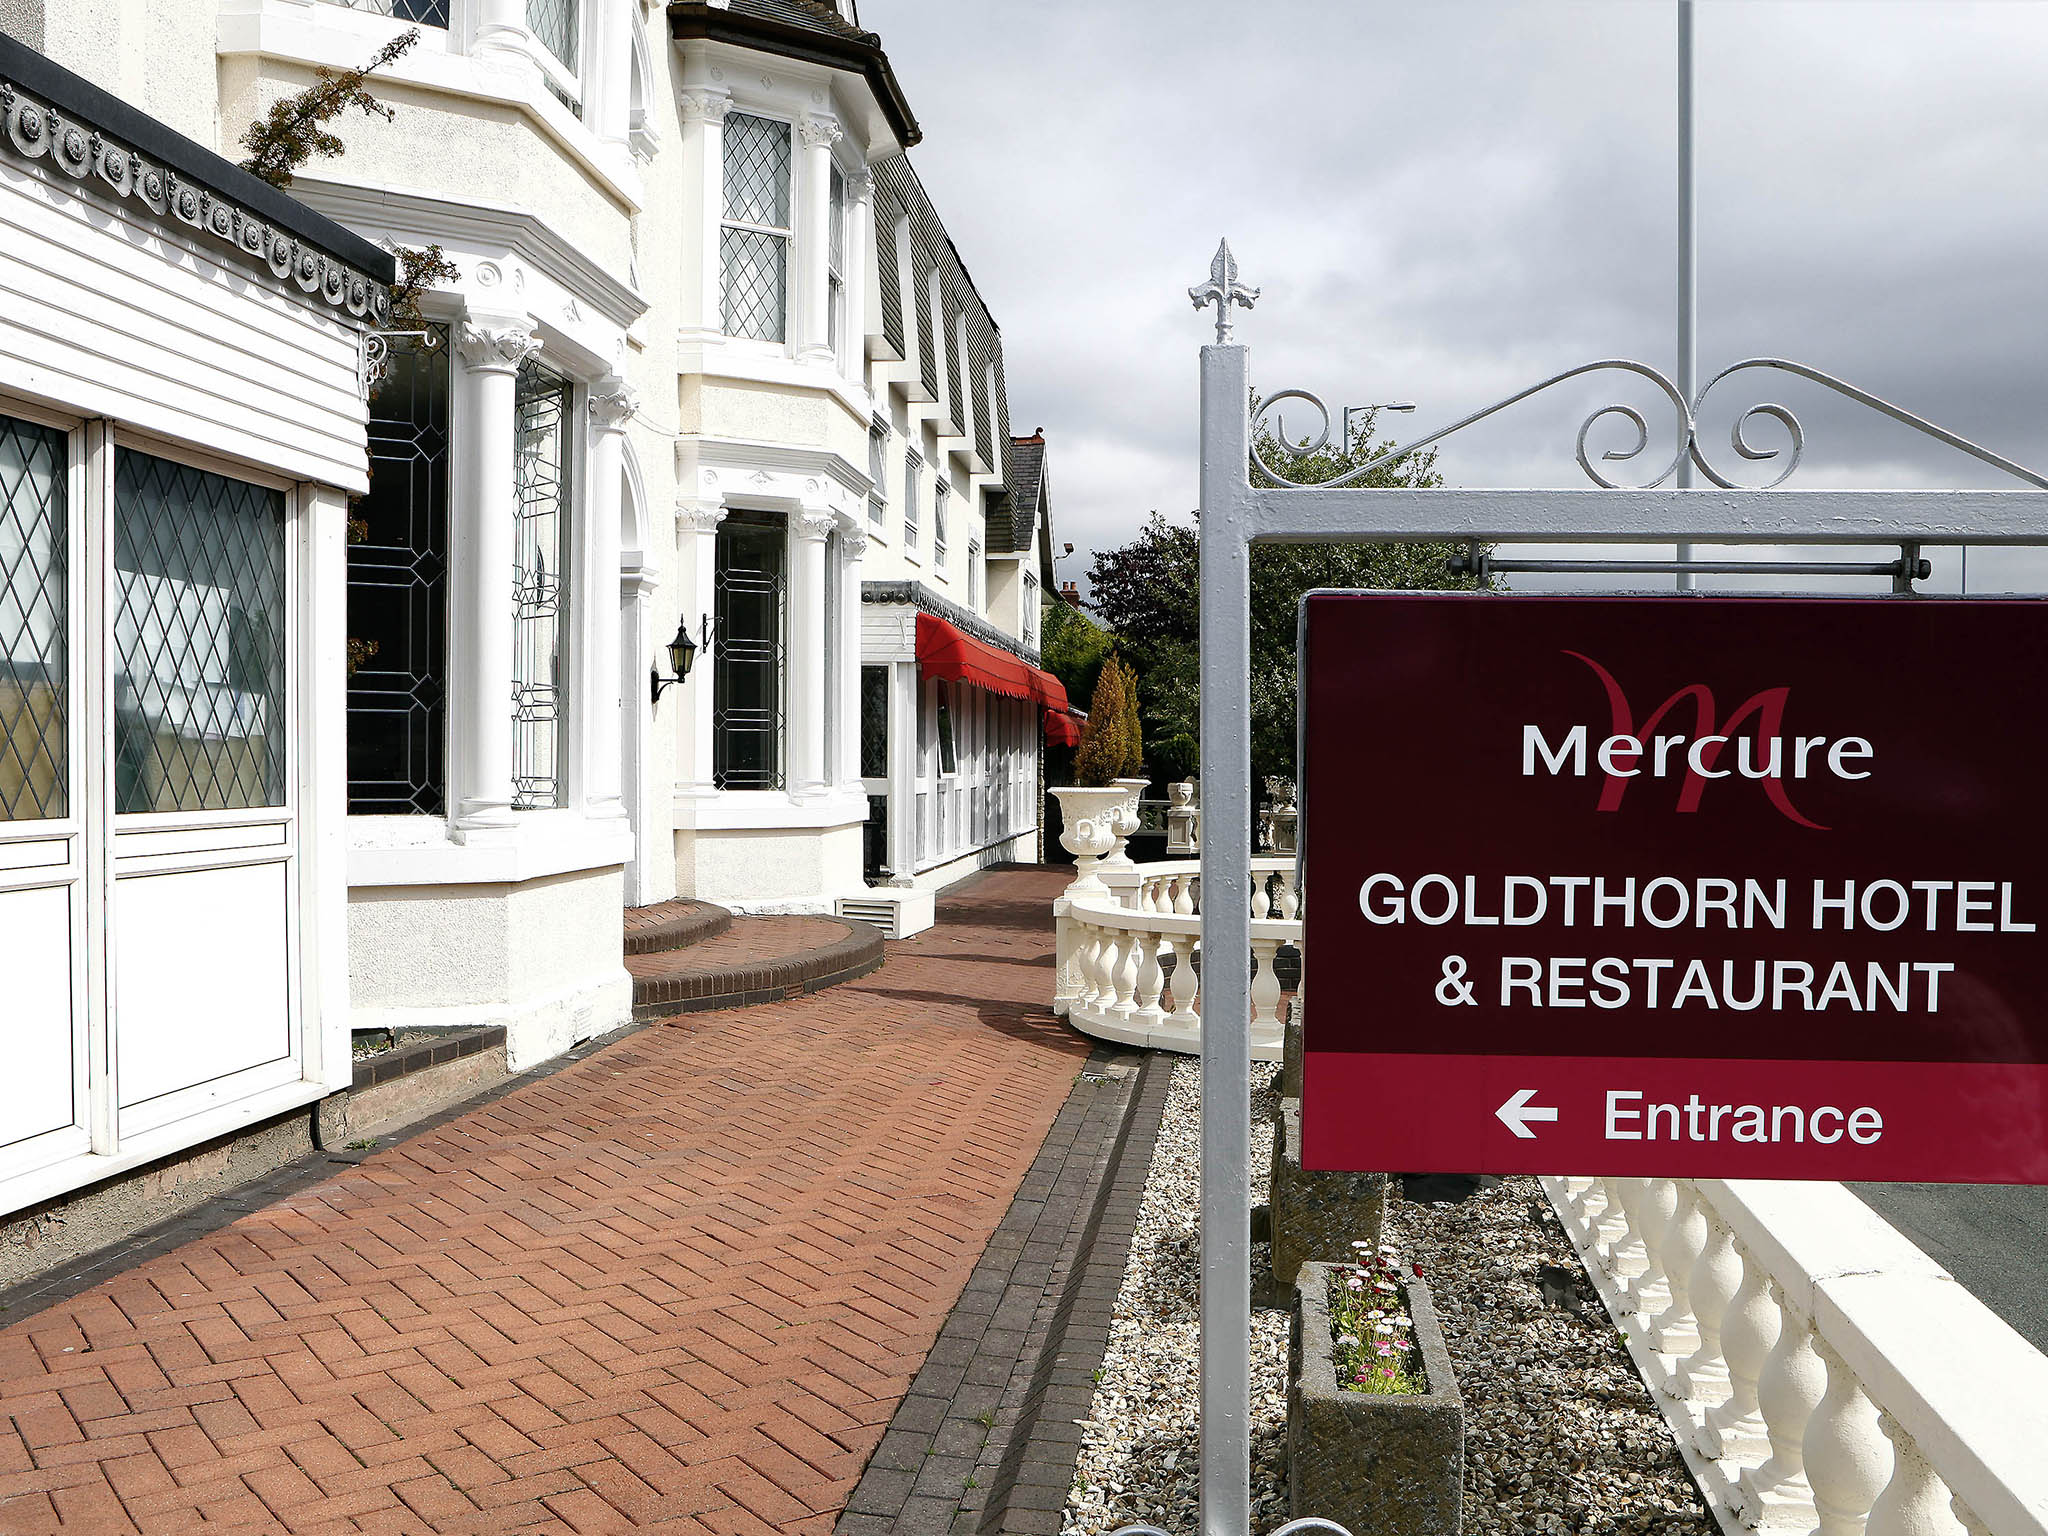 Otel – Mercure Wolverhampton Goldthorn Hotel